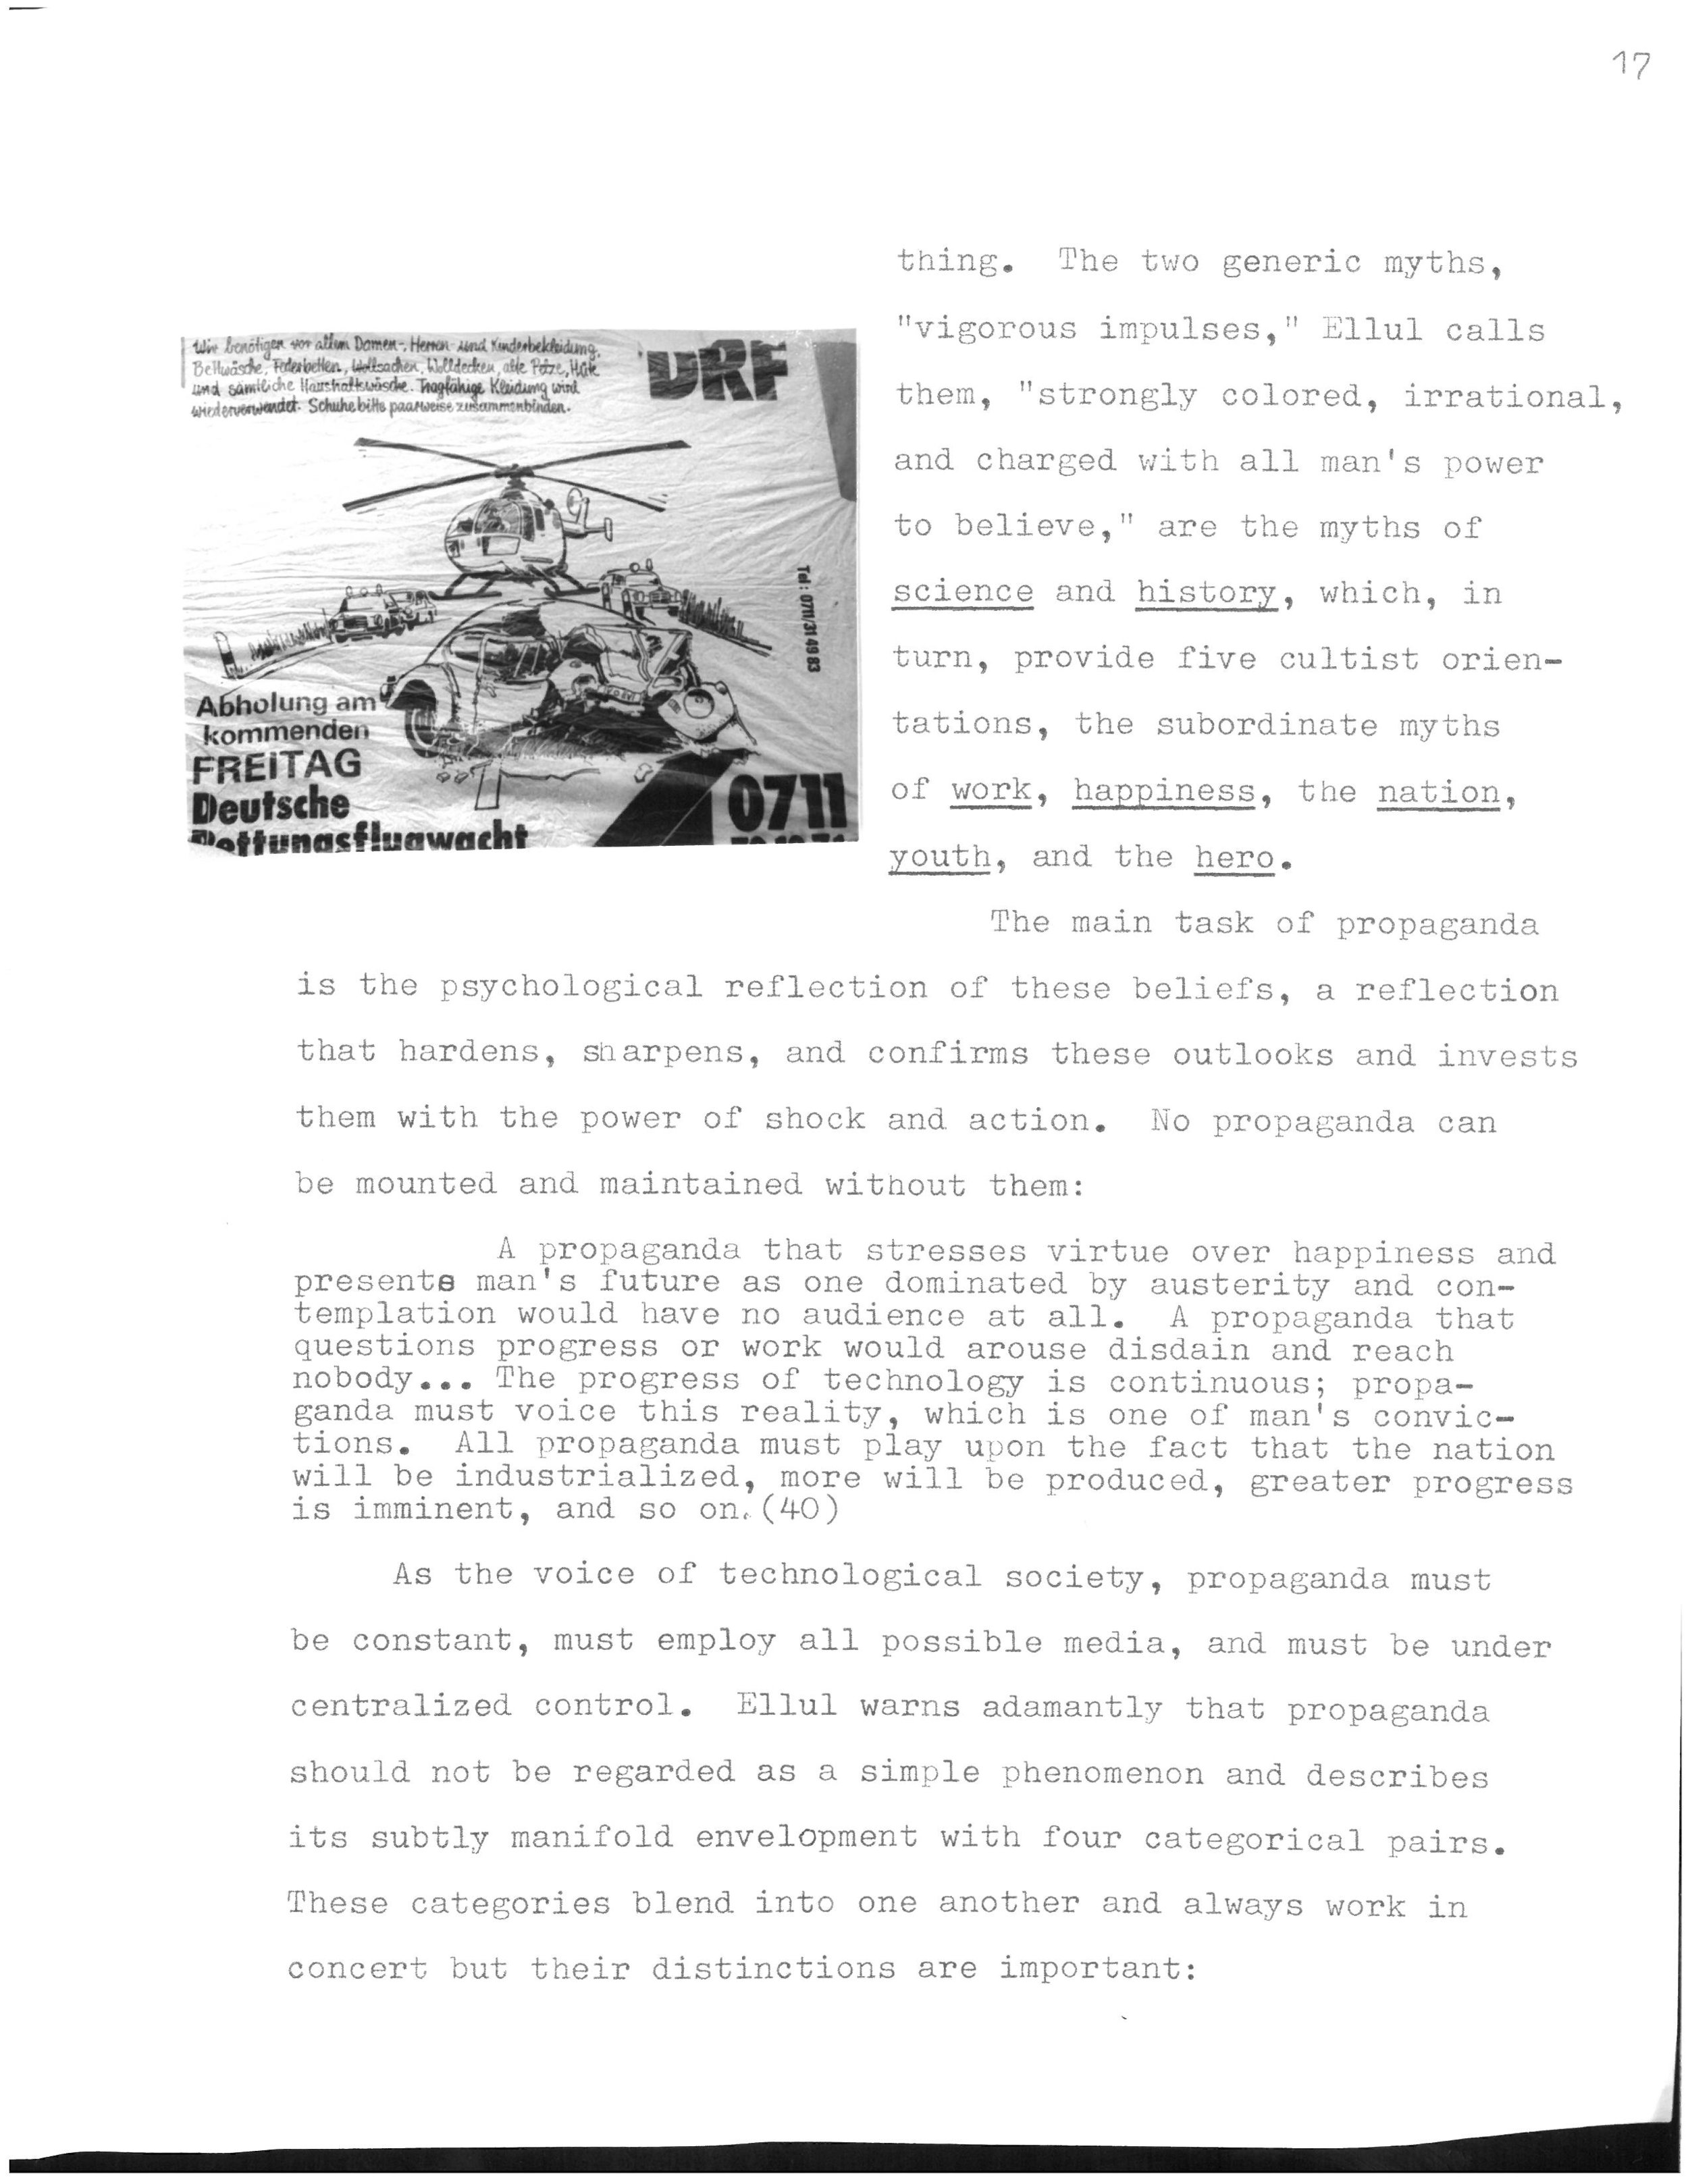 Propaganda_Page_19.jpg